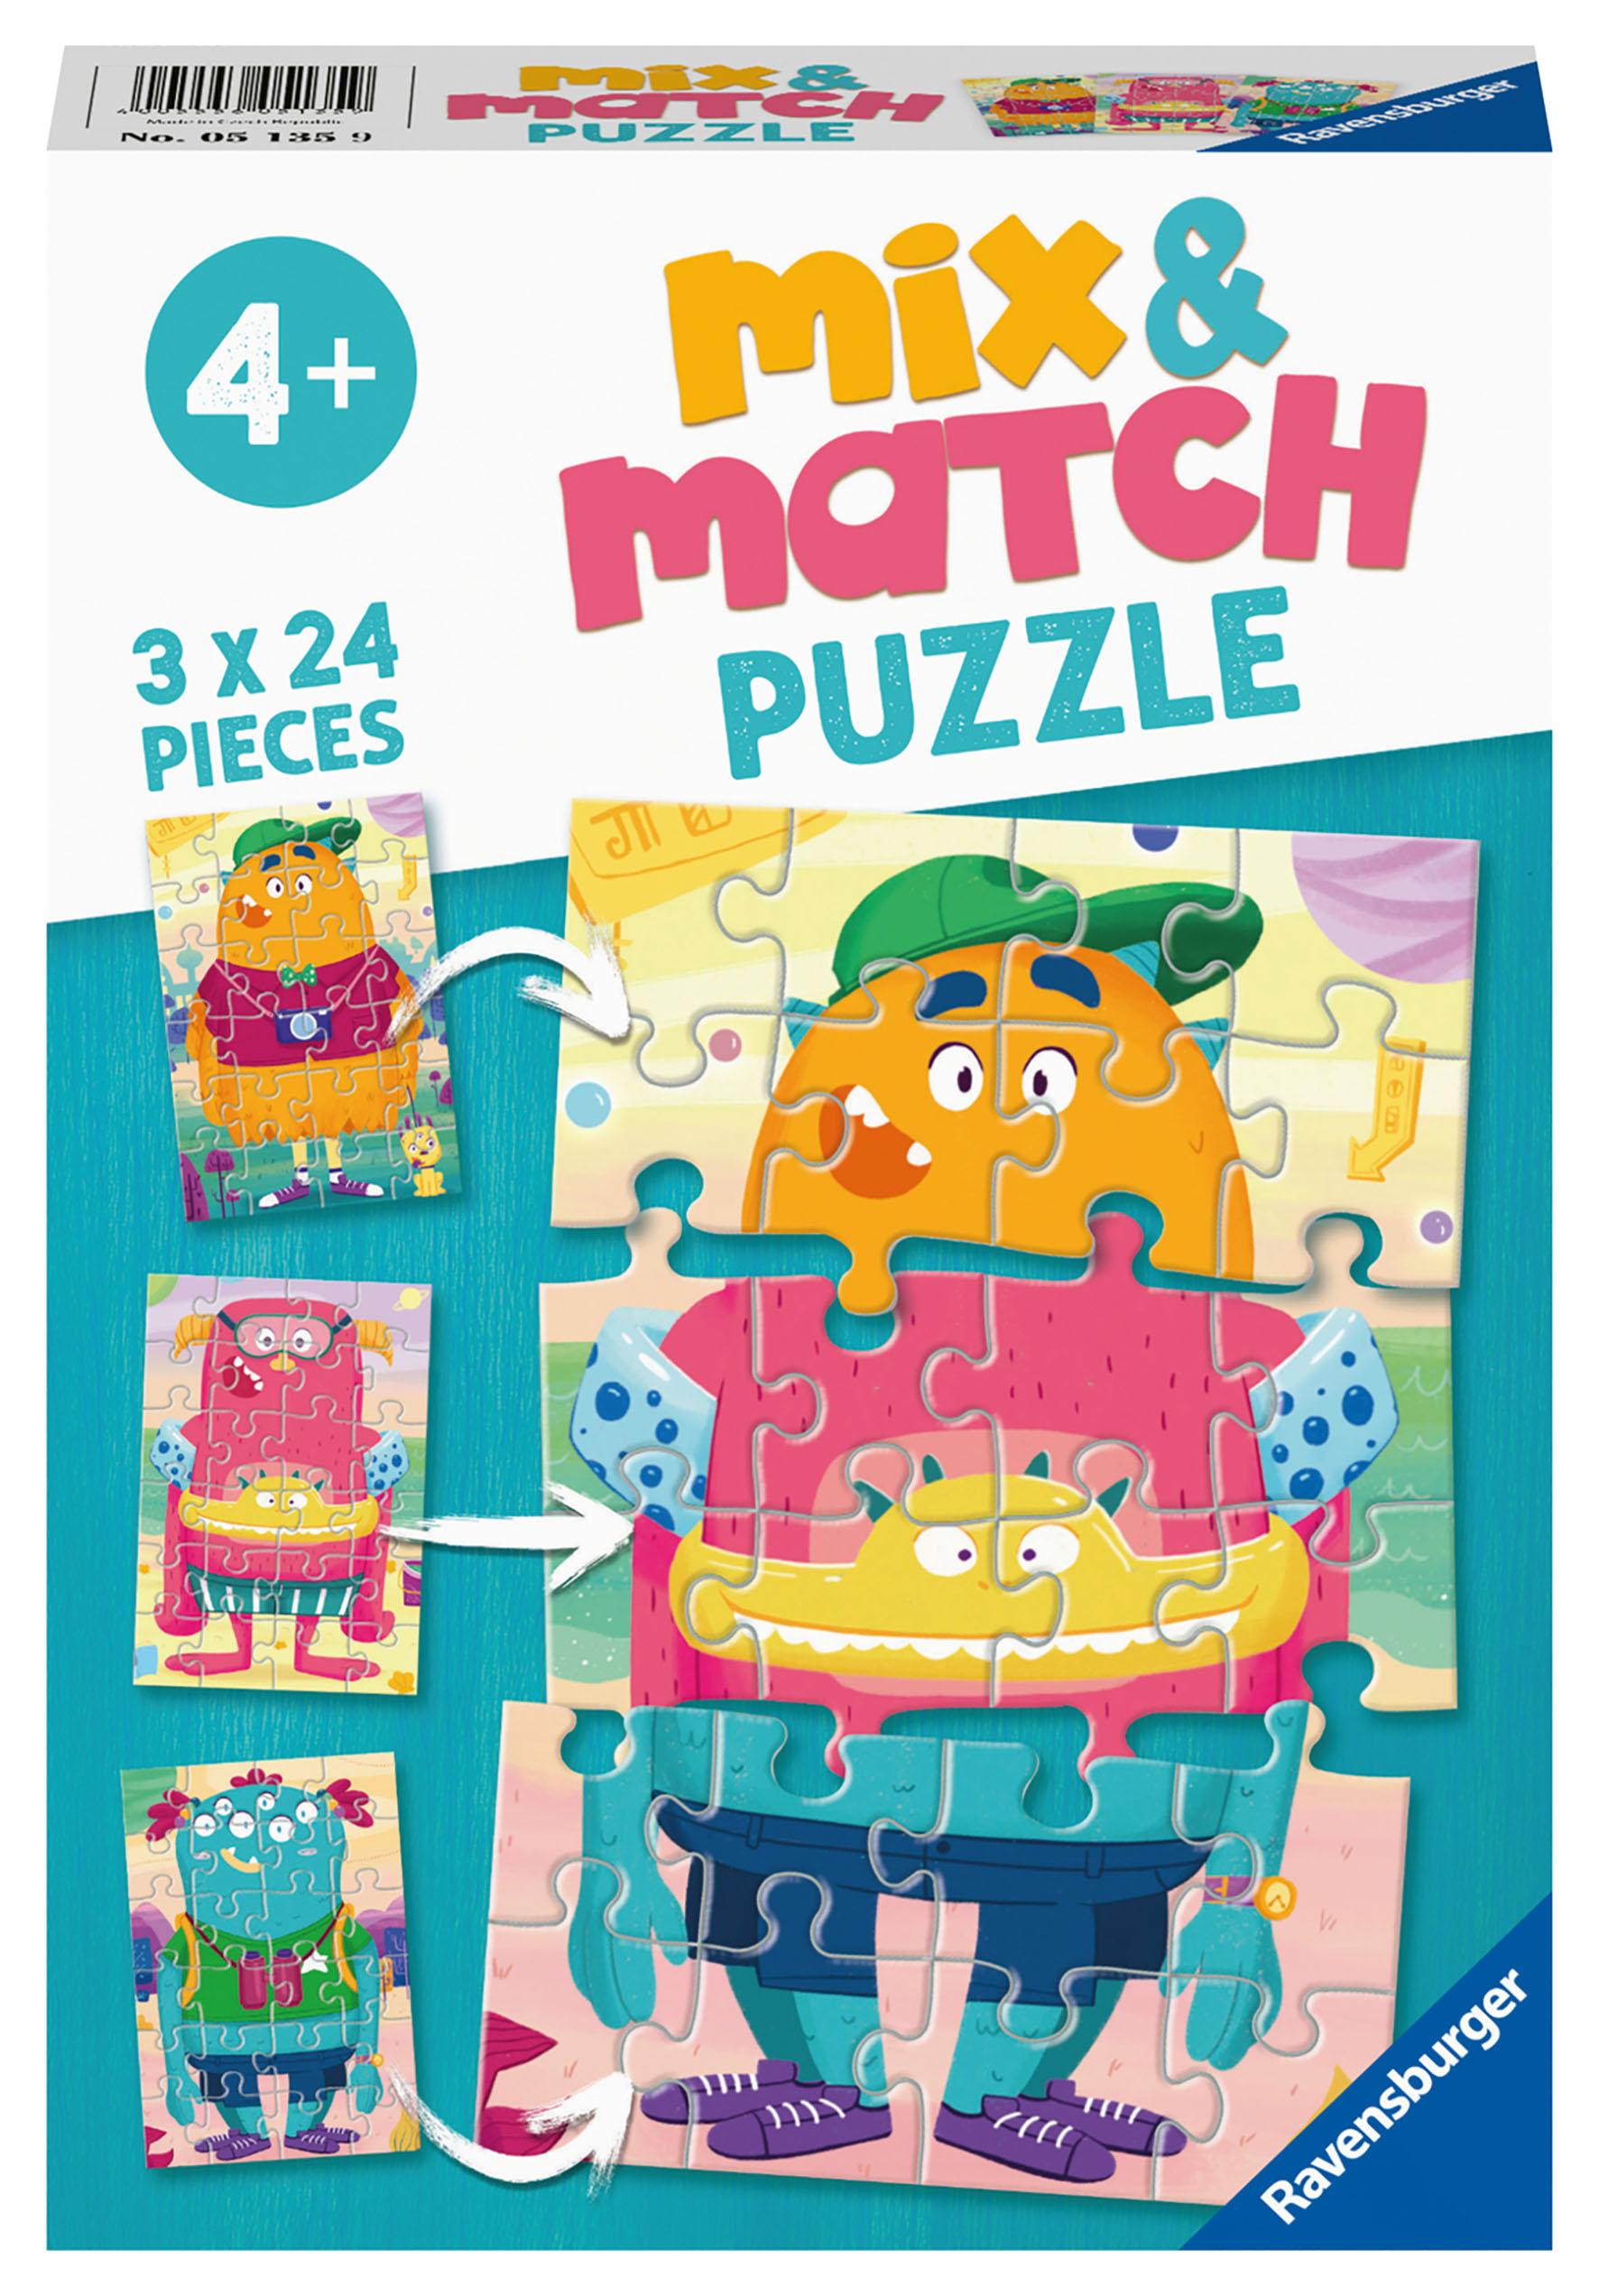 PUZZLE MIX MATCH MOSTRI 3X24